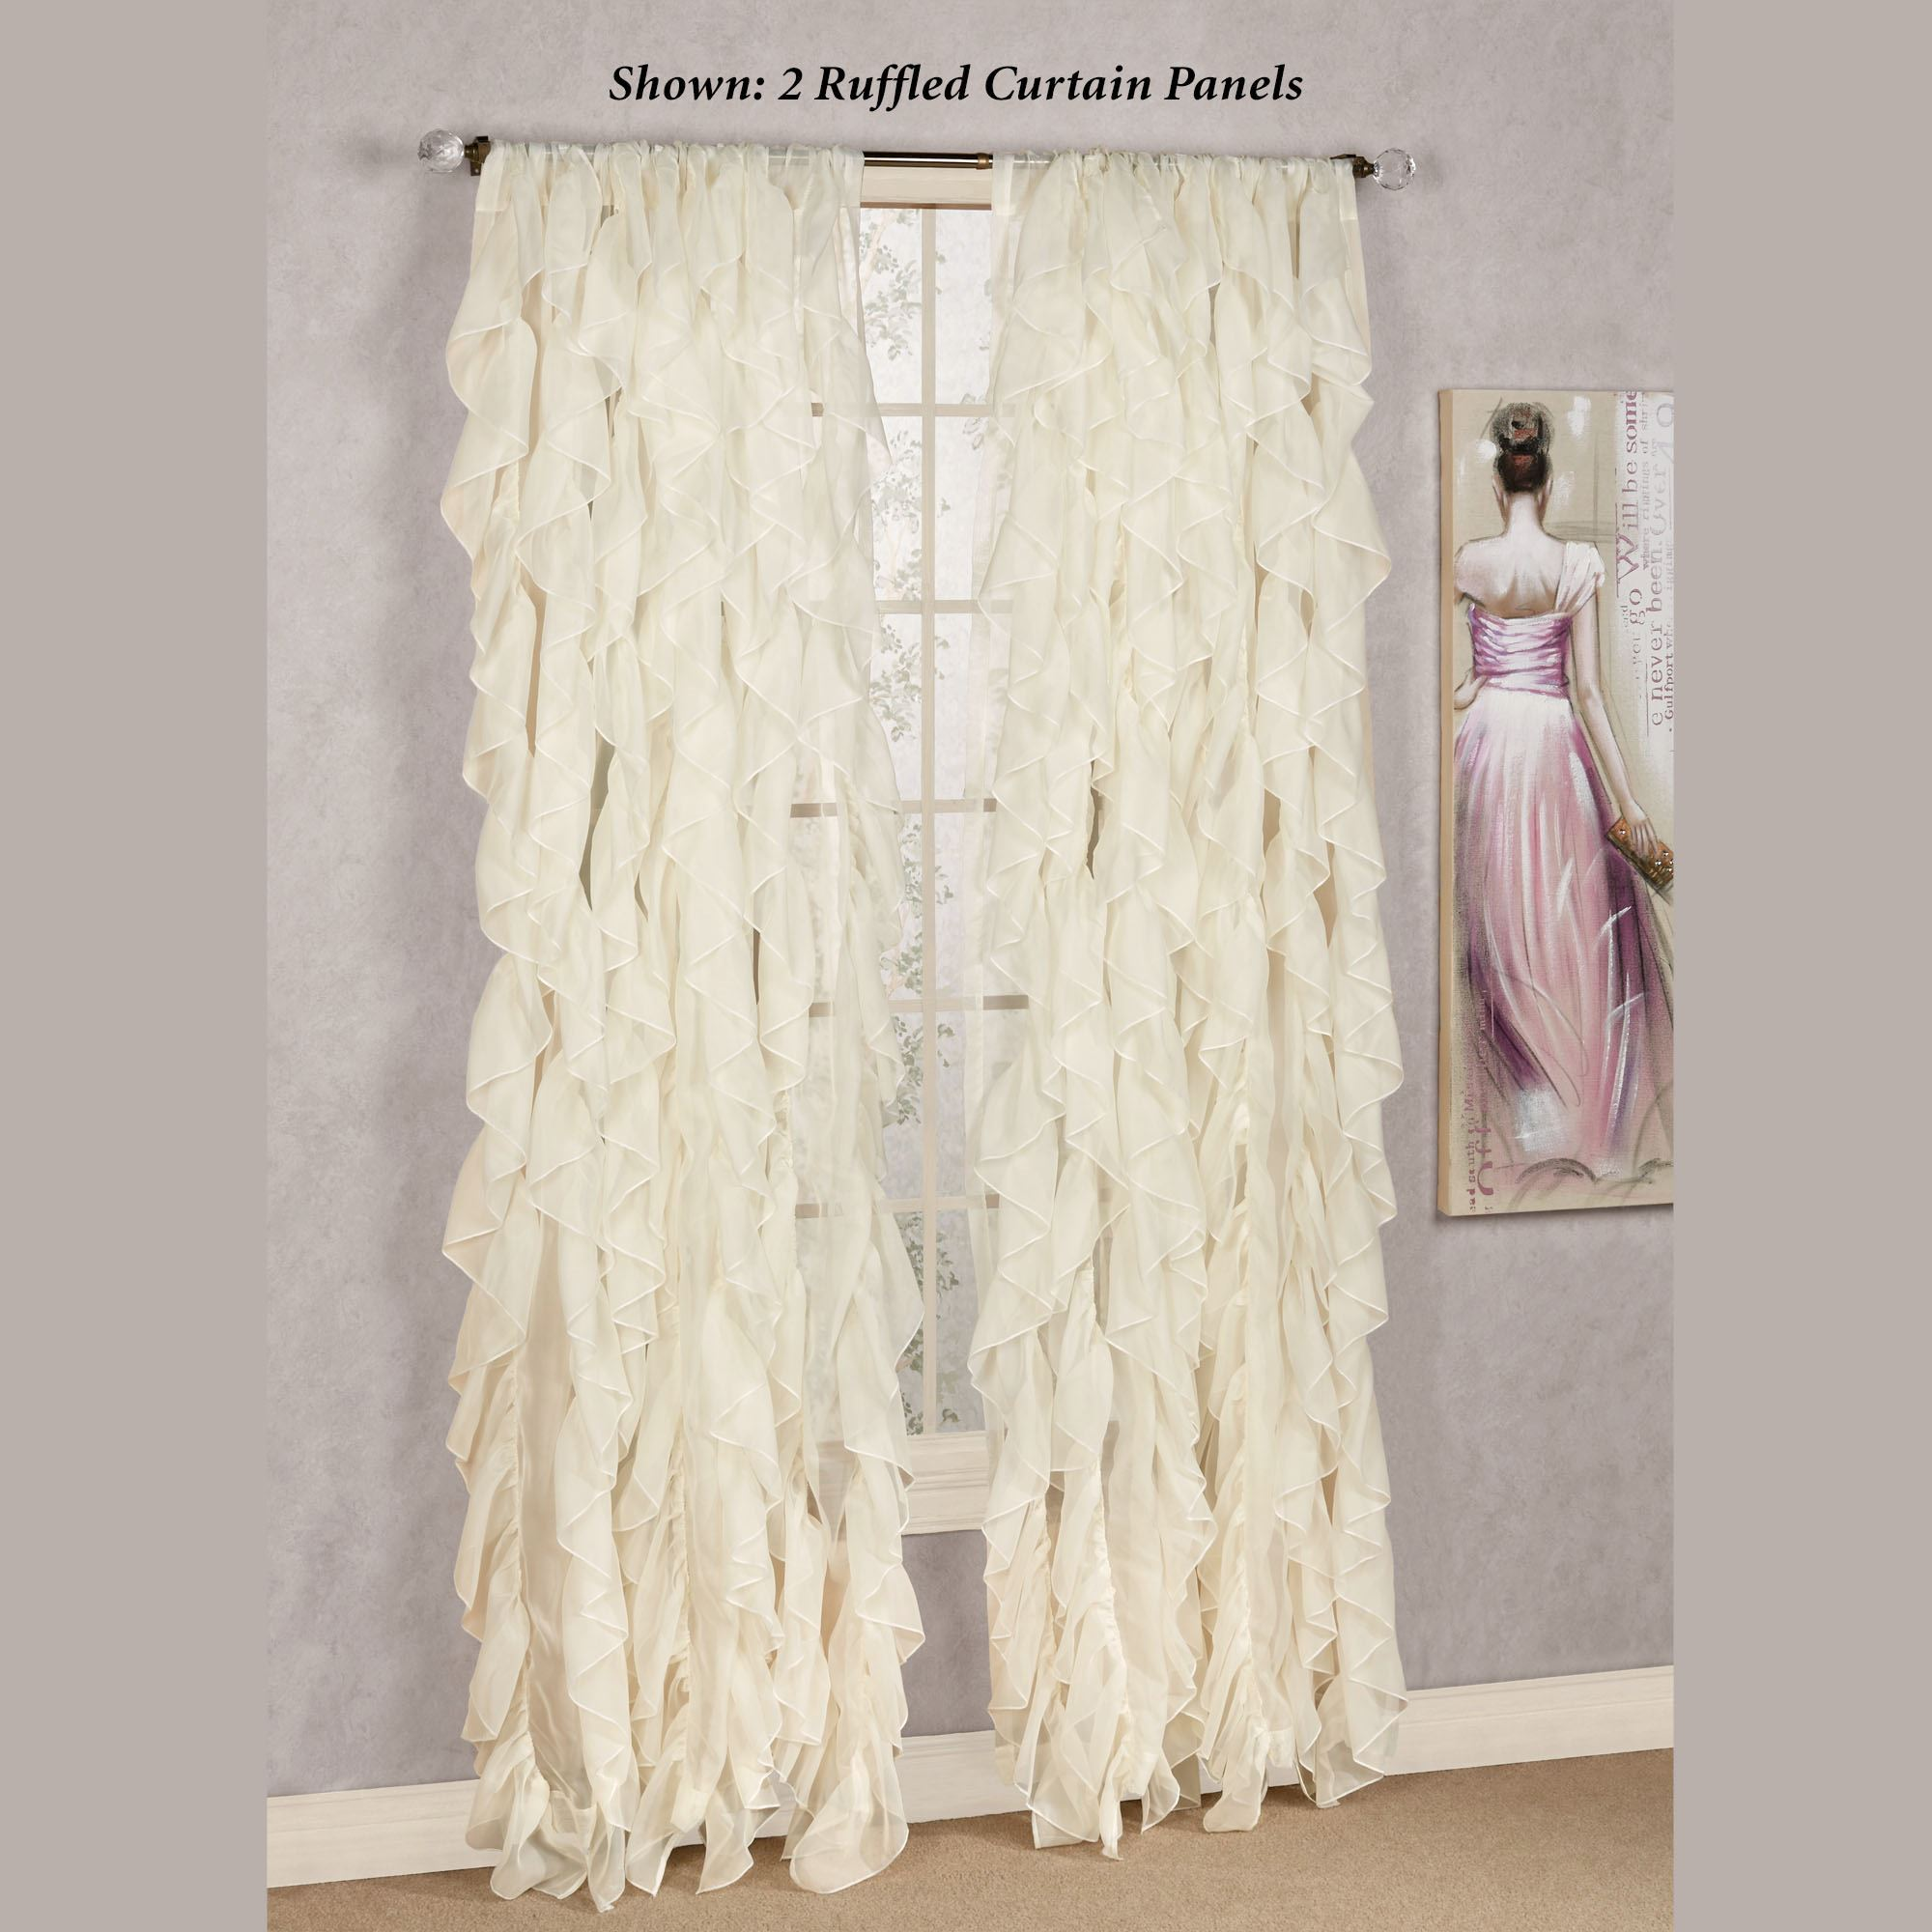 panel view curtains lorraine sheer ruffled curtain home ruffle cream fashions gypsy